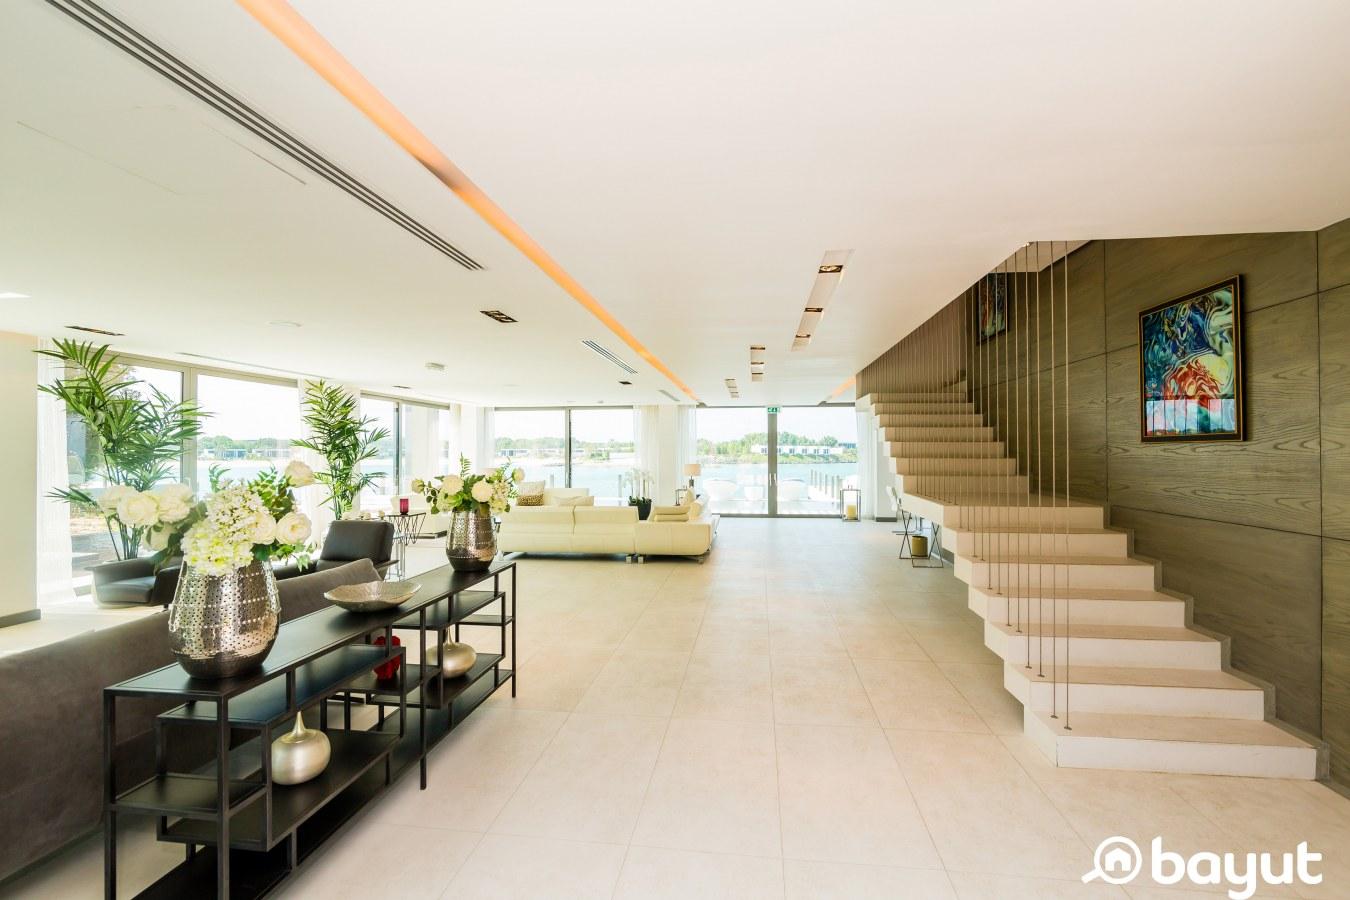 staircase and ground floor of a spacious villa in Nurai Island Abu Dhabi